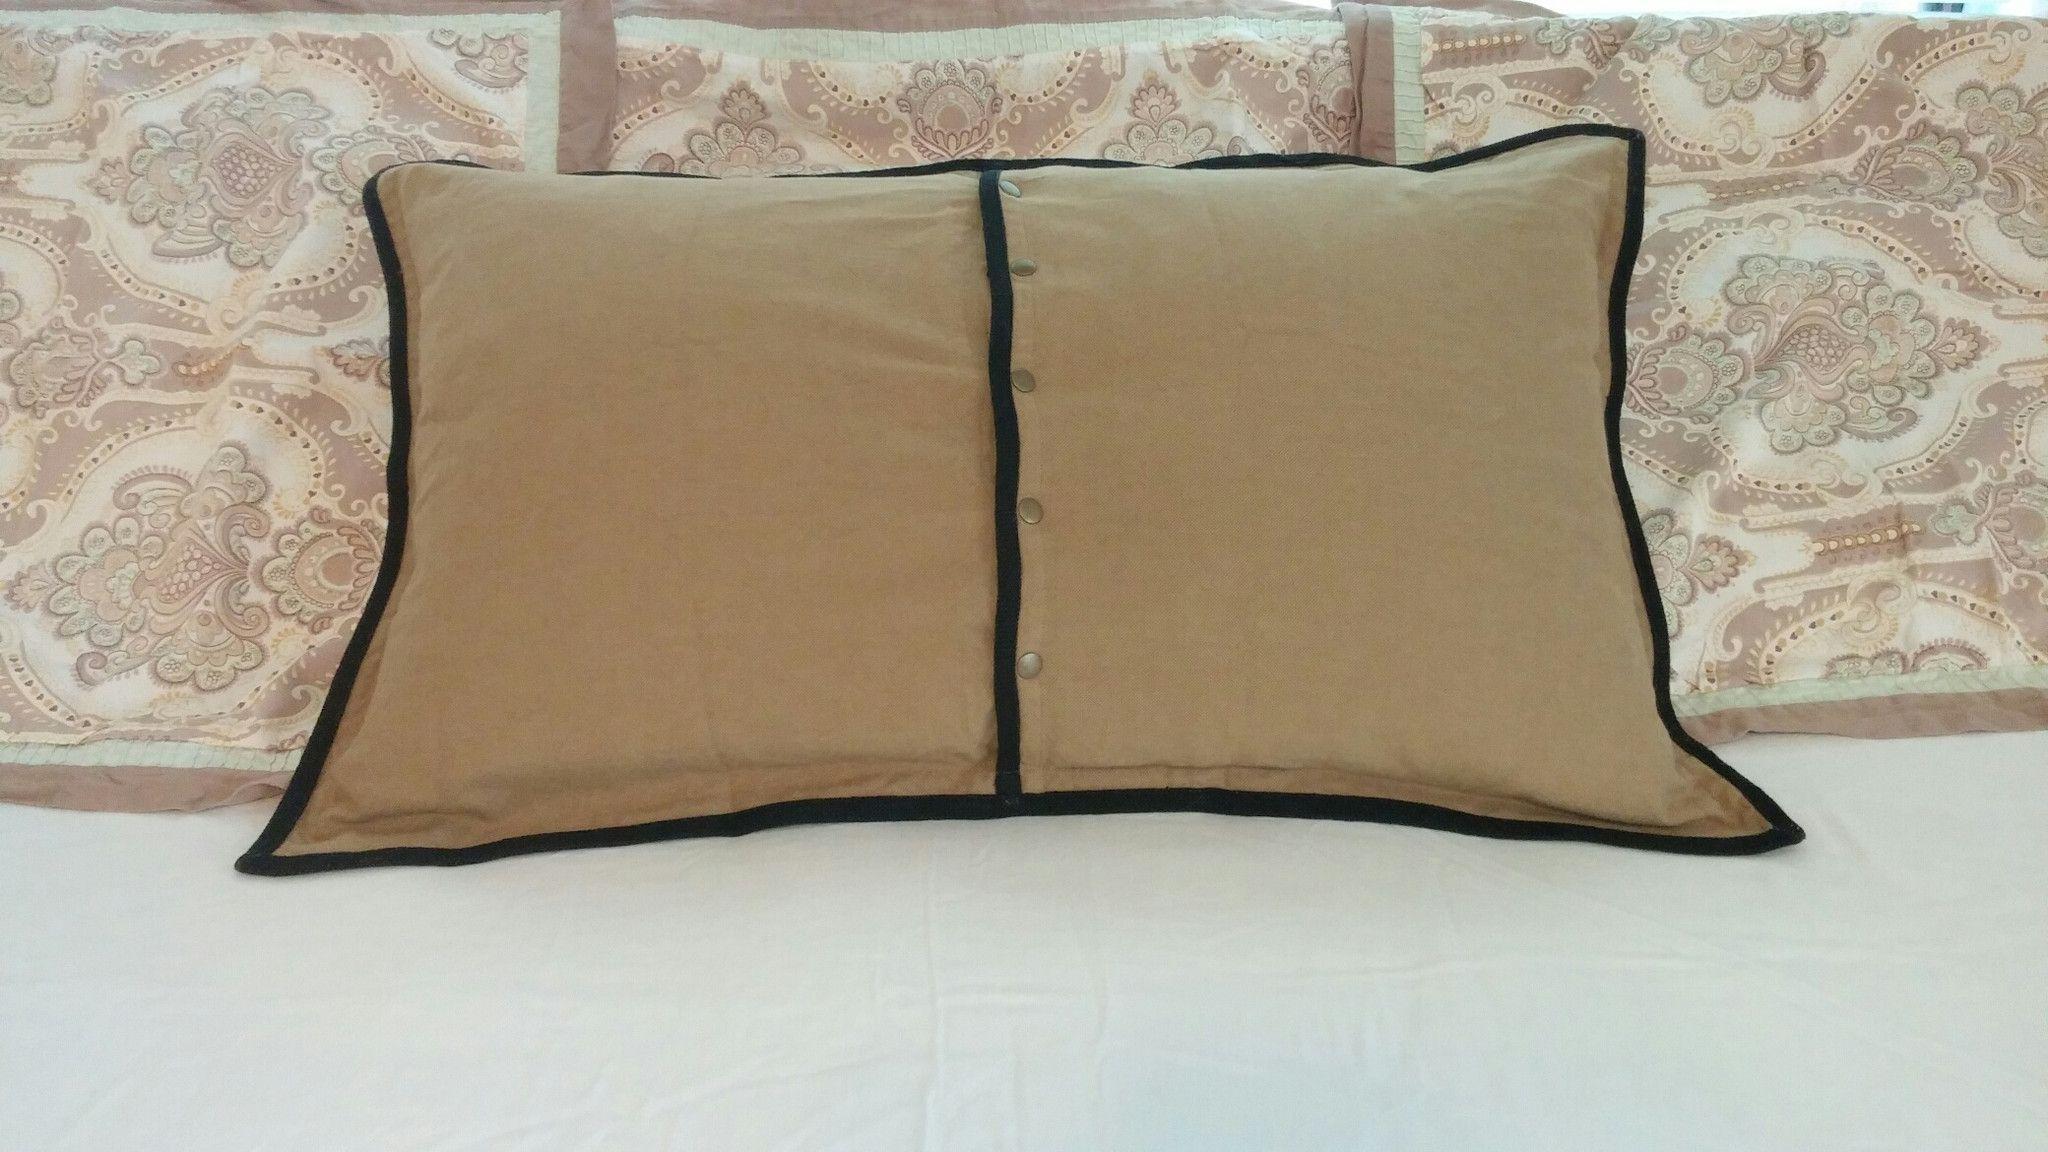 Pillow Sham Lauren #Ralph Lauren Green Label King Size Reversible 100% Cotton Tan Solid Color with 5 snap closure